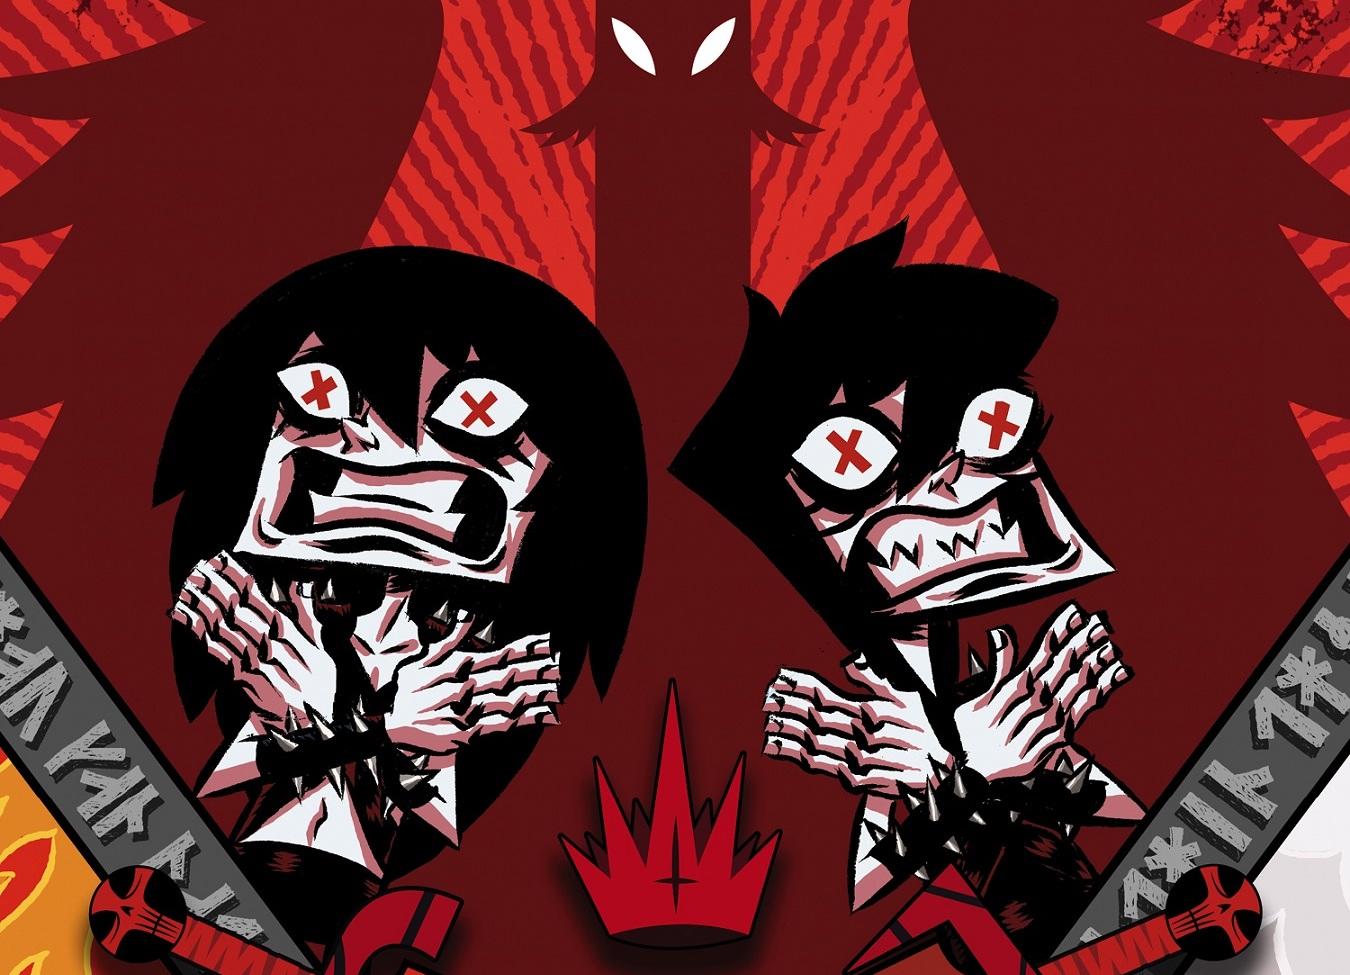 Black Metal: le avventure metallare di Shawn e Sam tornano a Lucca Comics